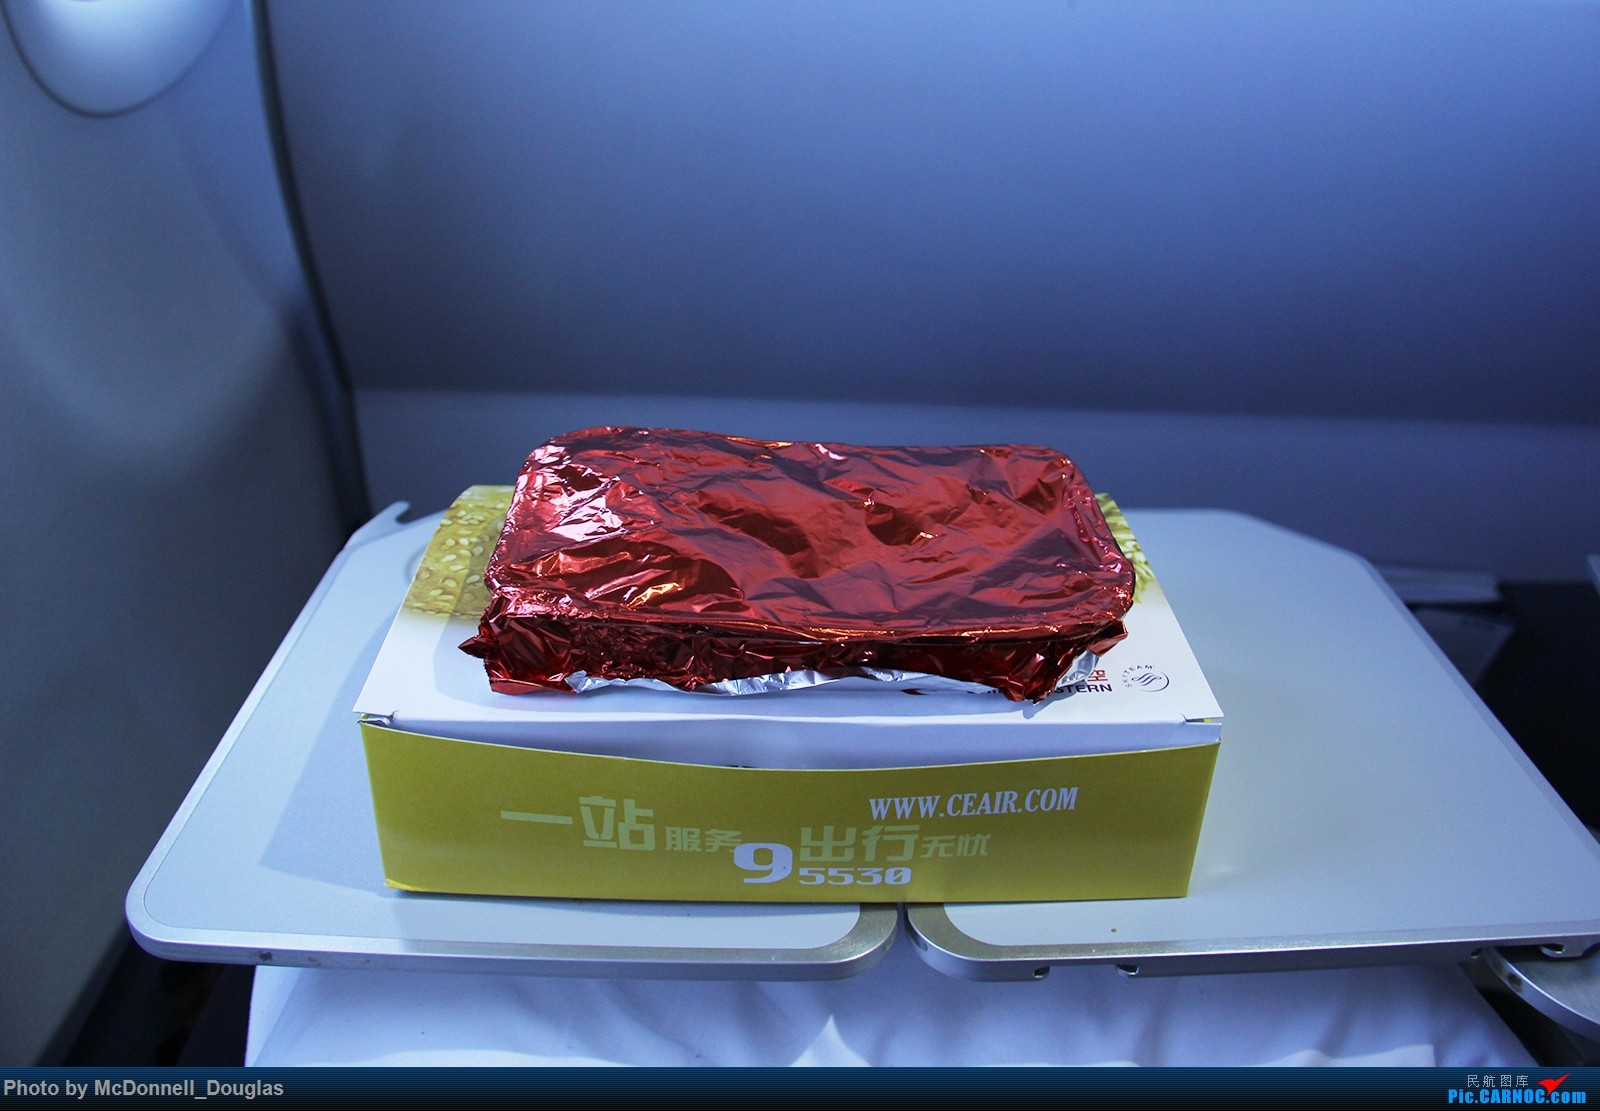 Re:[原创]【上海飞友会】【zc带你走天下(2)】再访祖辈年轻时工作的土地,父母年少时生活戈壁,跨越大半个中国去看新疆,回程小游蓉城(上) AIRBUS A320-232 B-8237